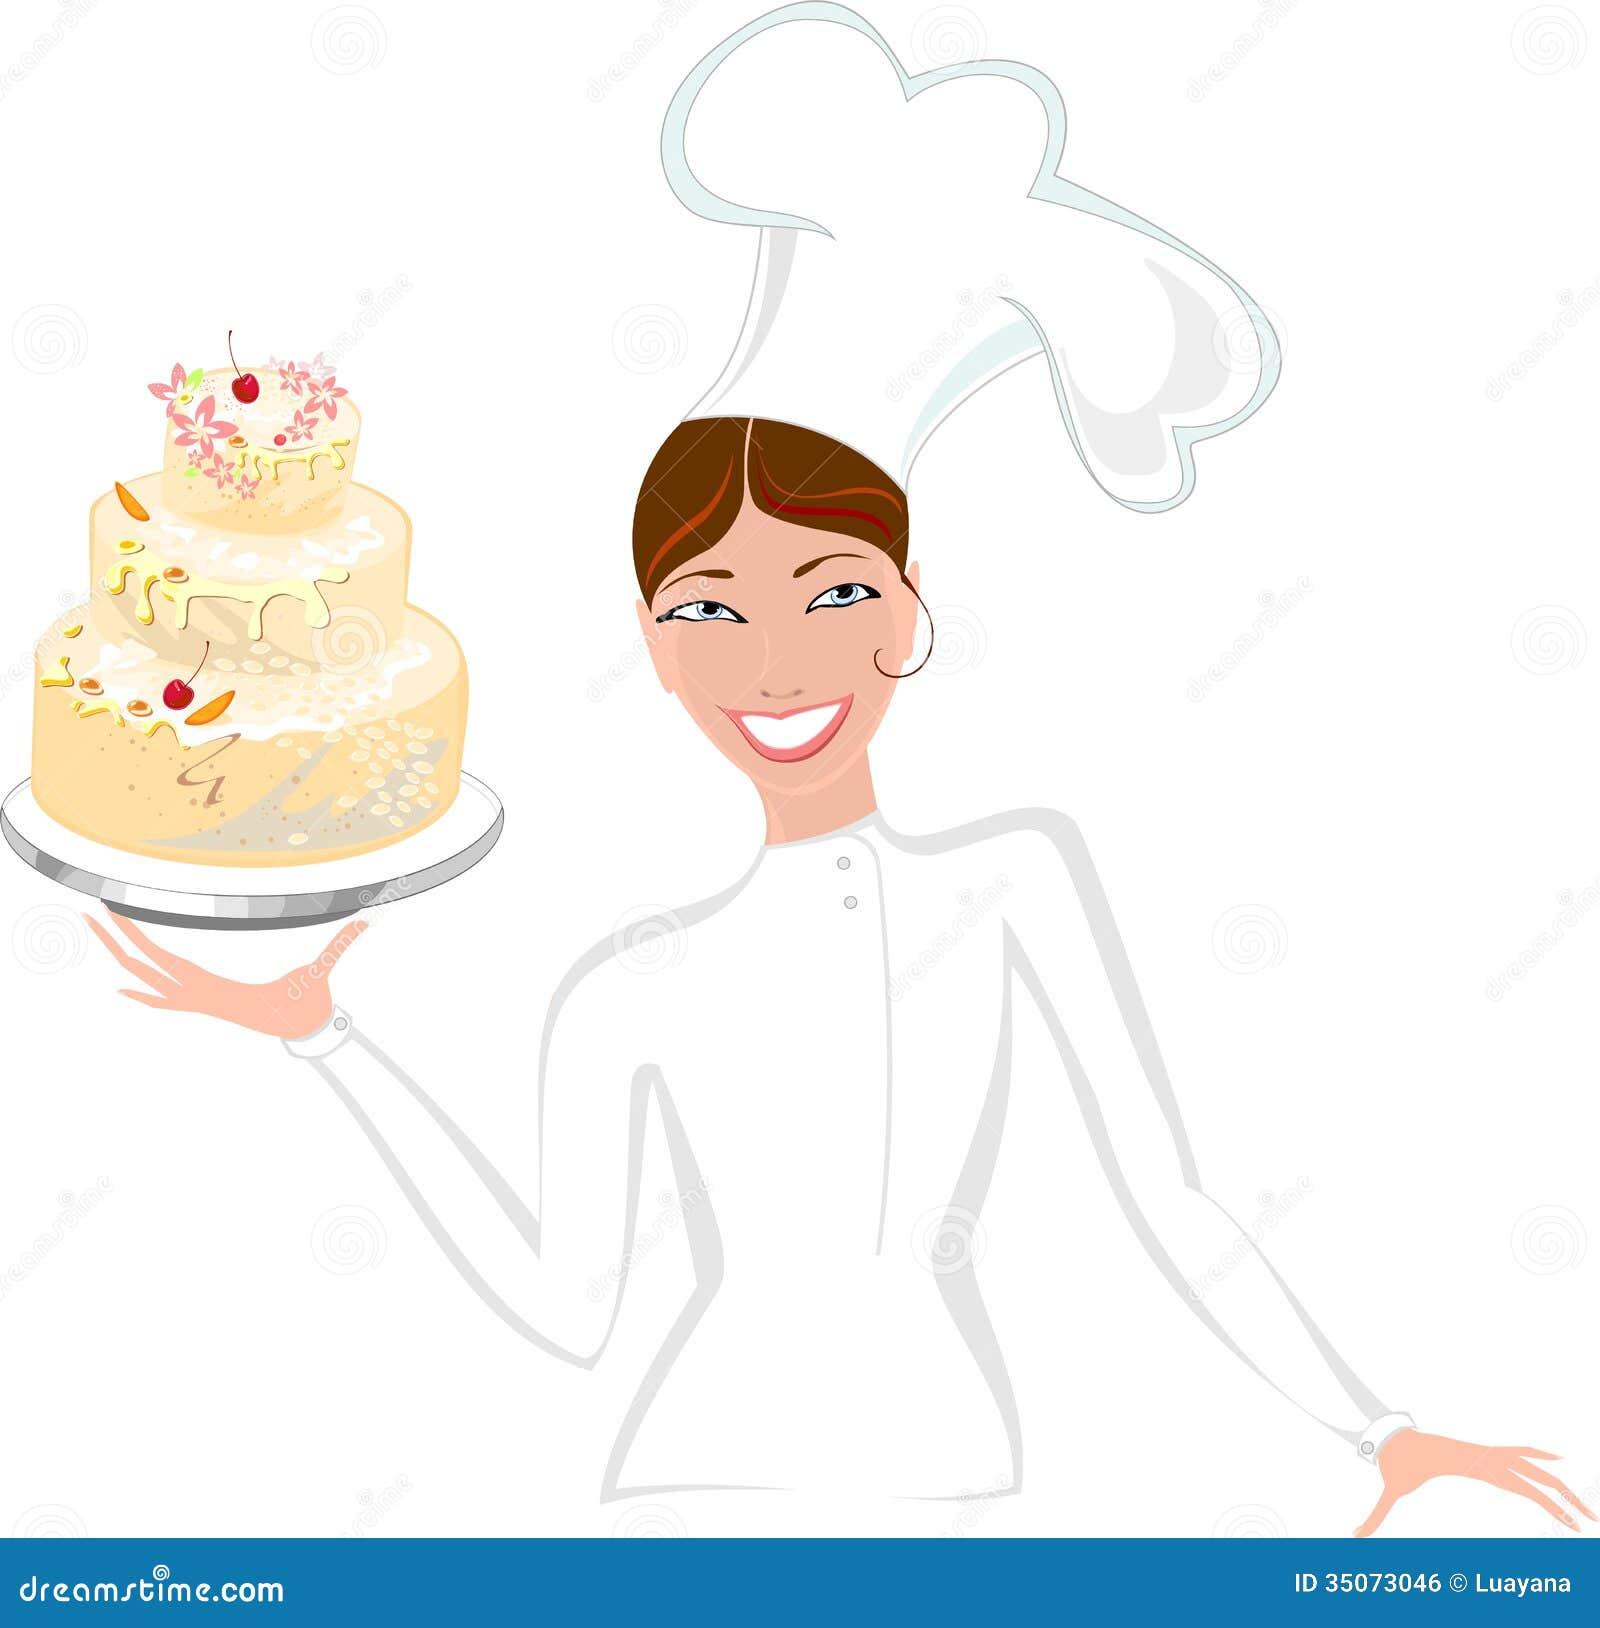 Cake Cartoon Images Black And White